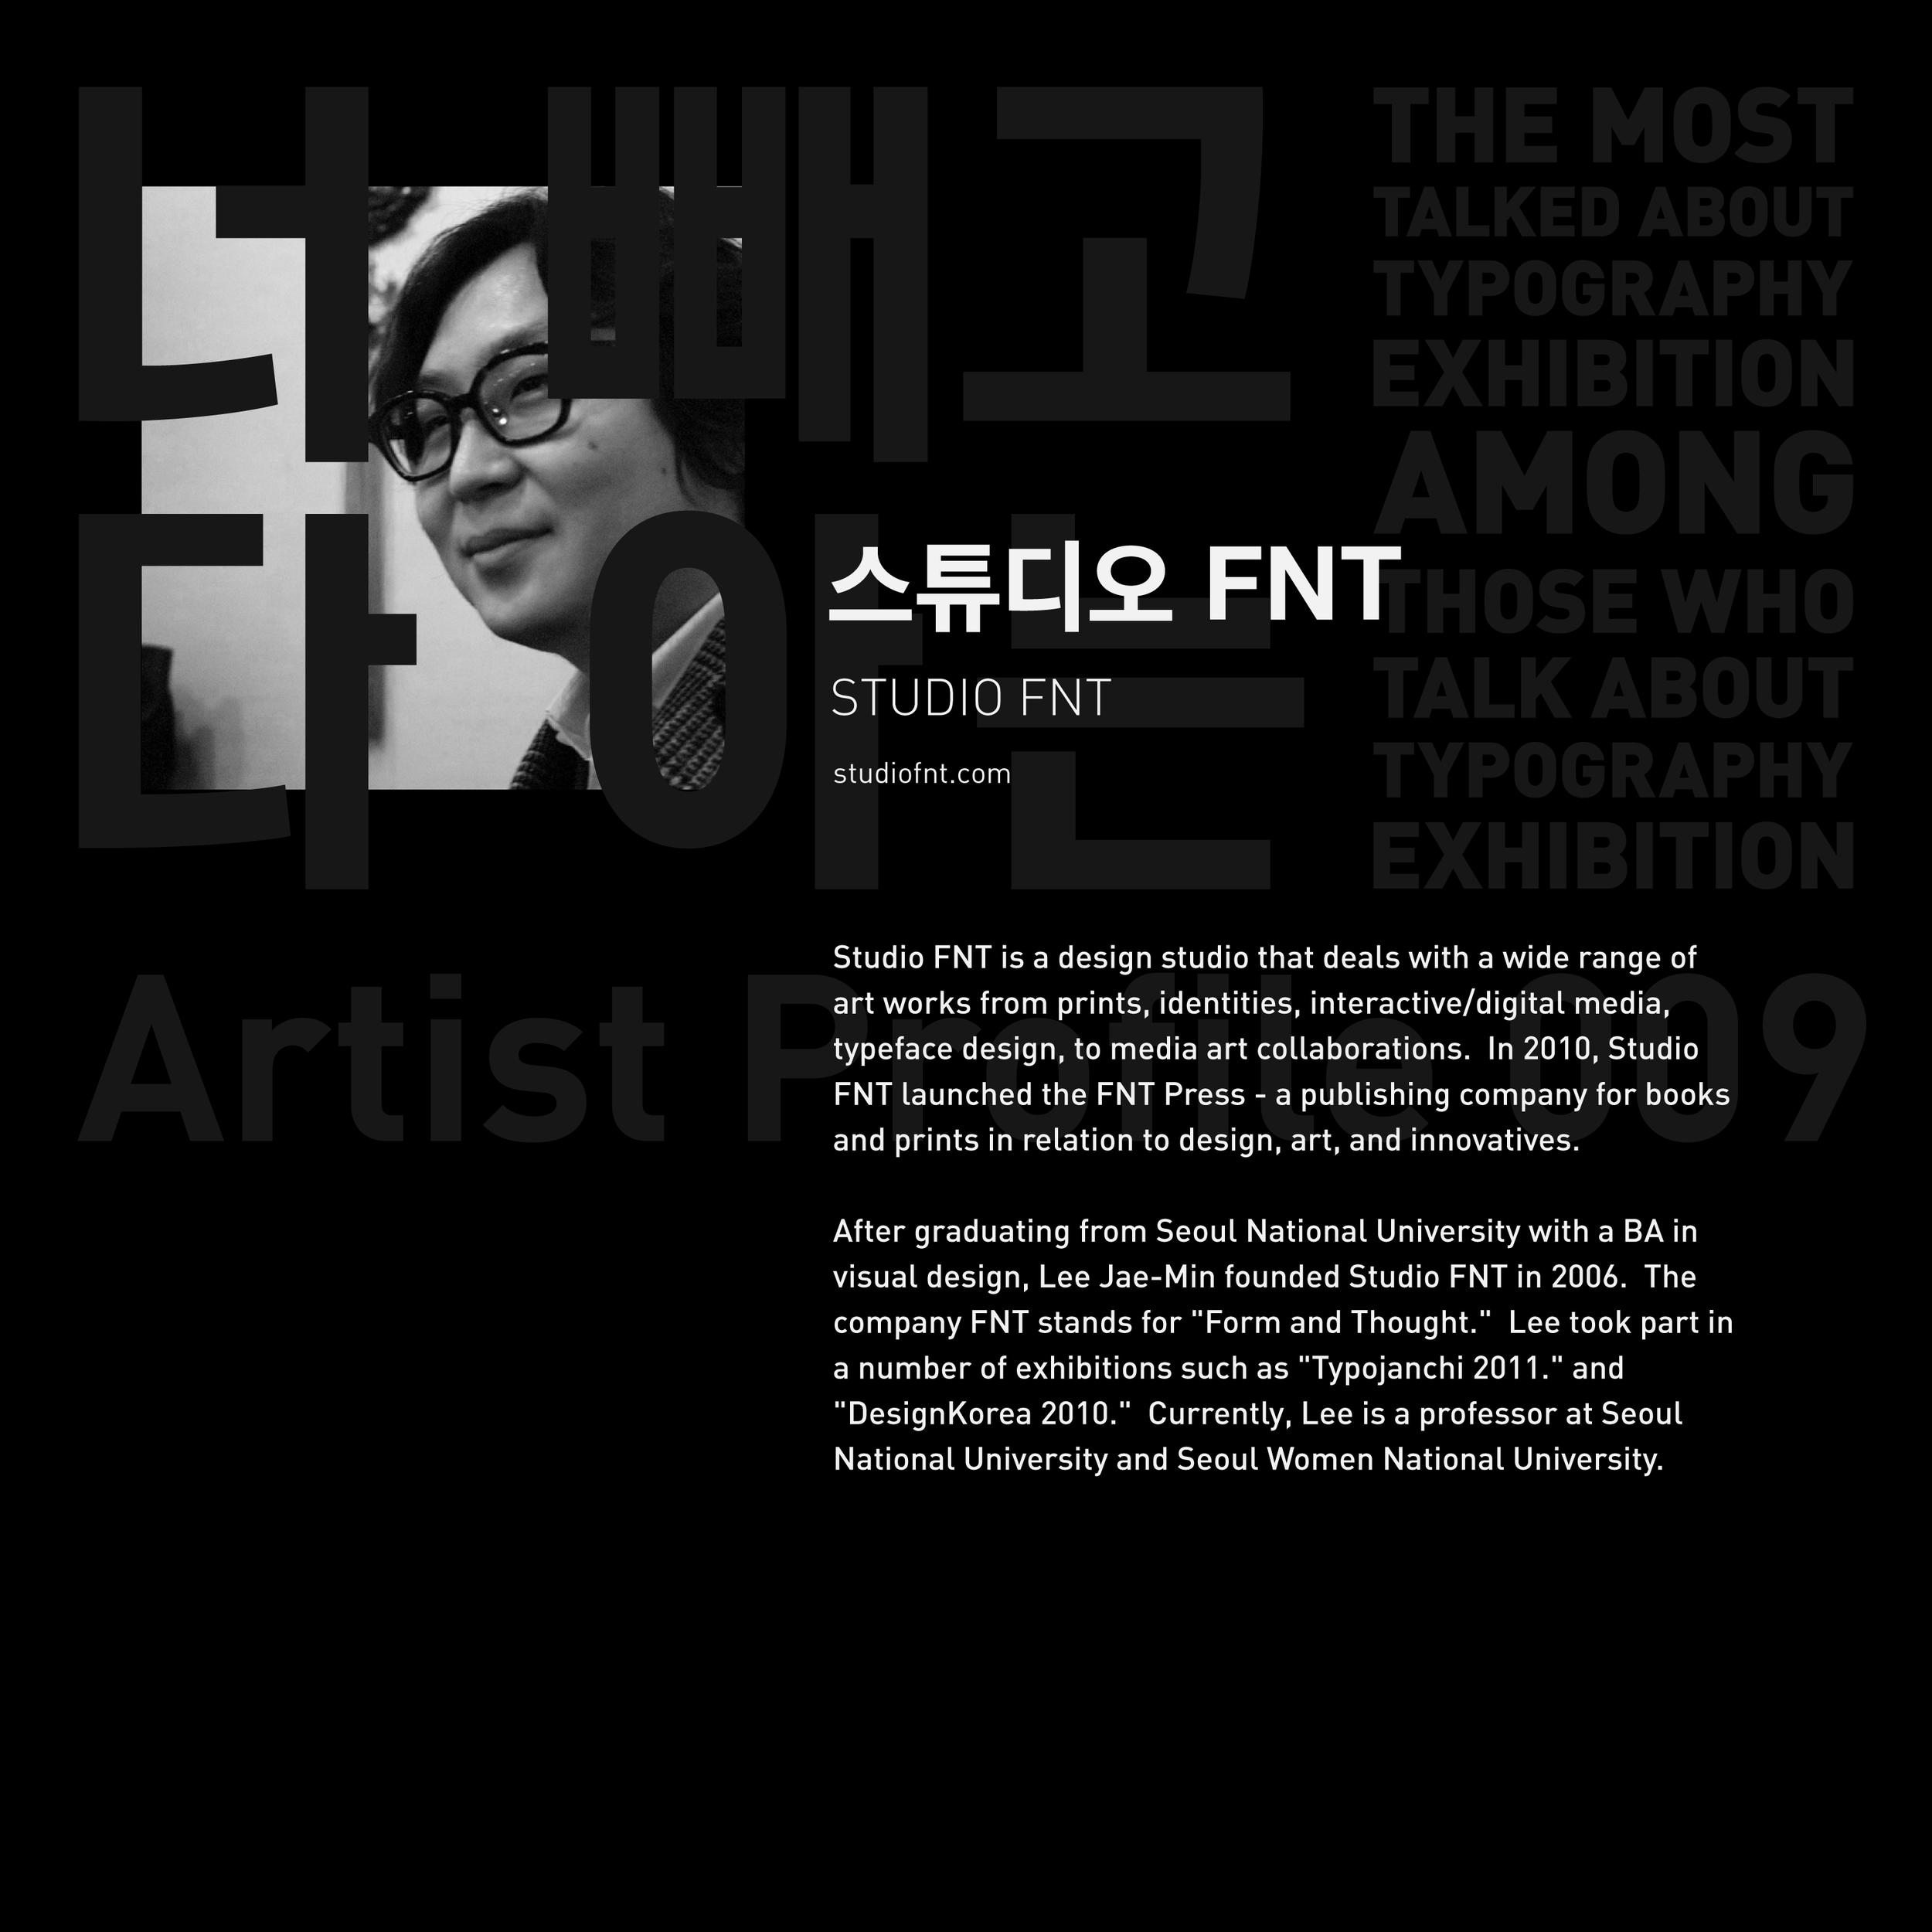 KoreanTypeExhibit_ArtistProfile_V2-09.png